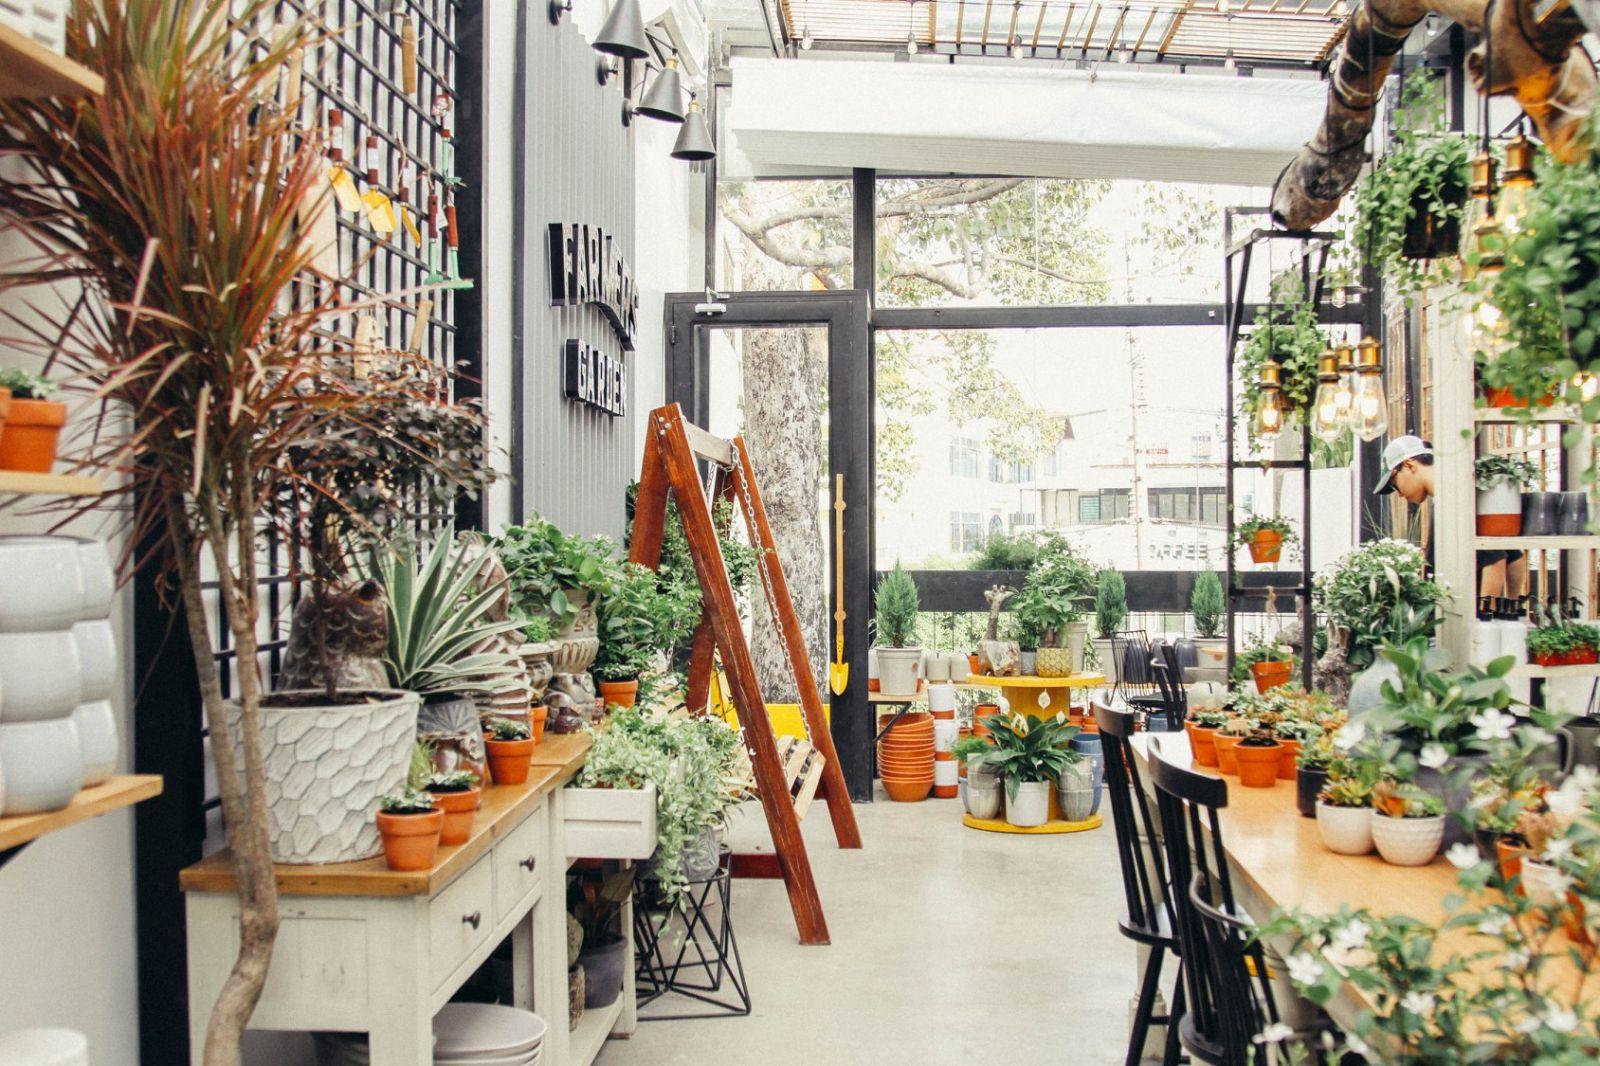 bày trí nội thất quán cafe farmer garden